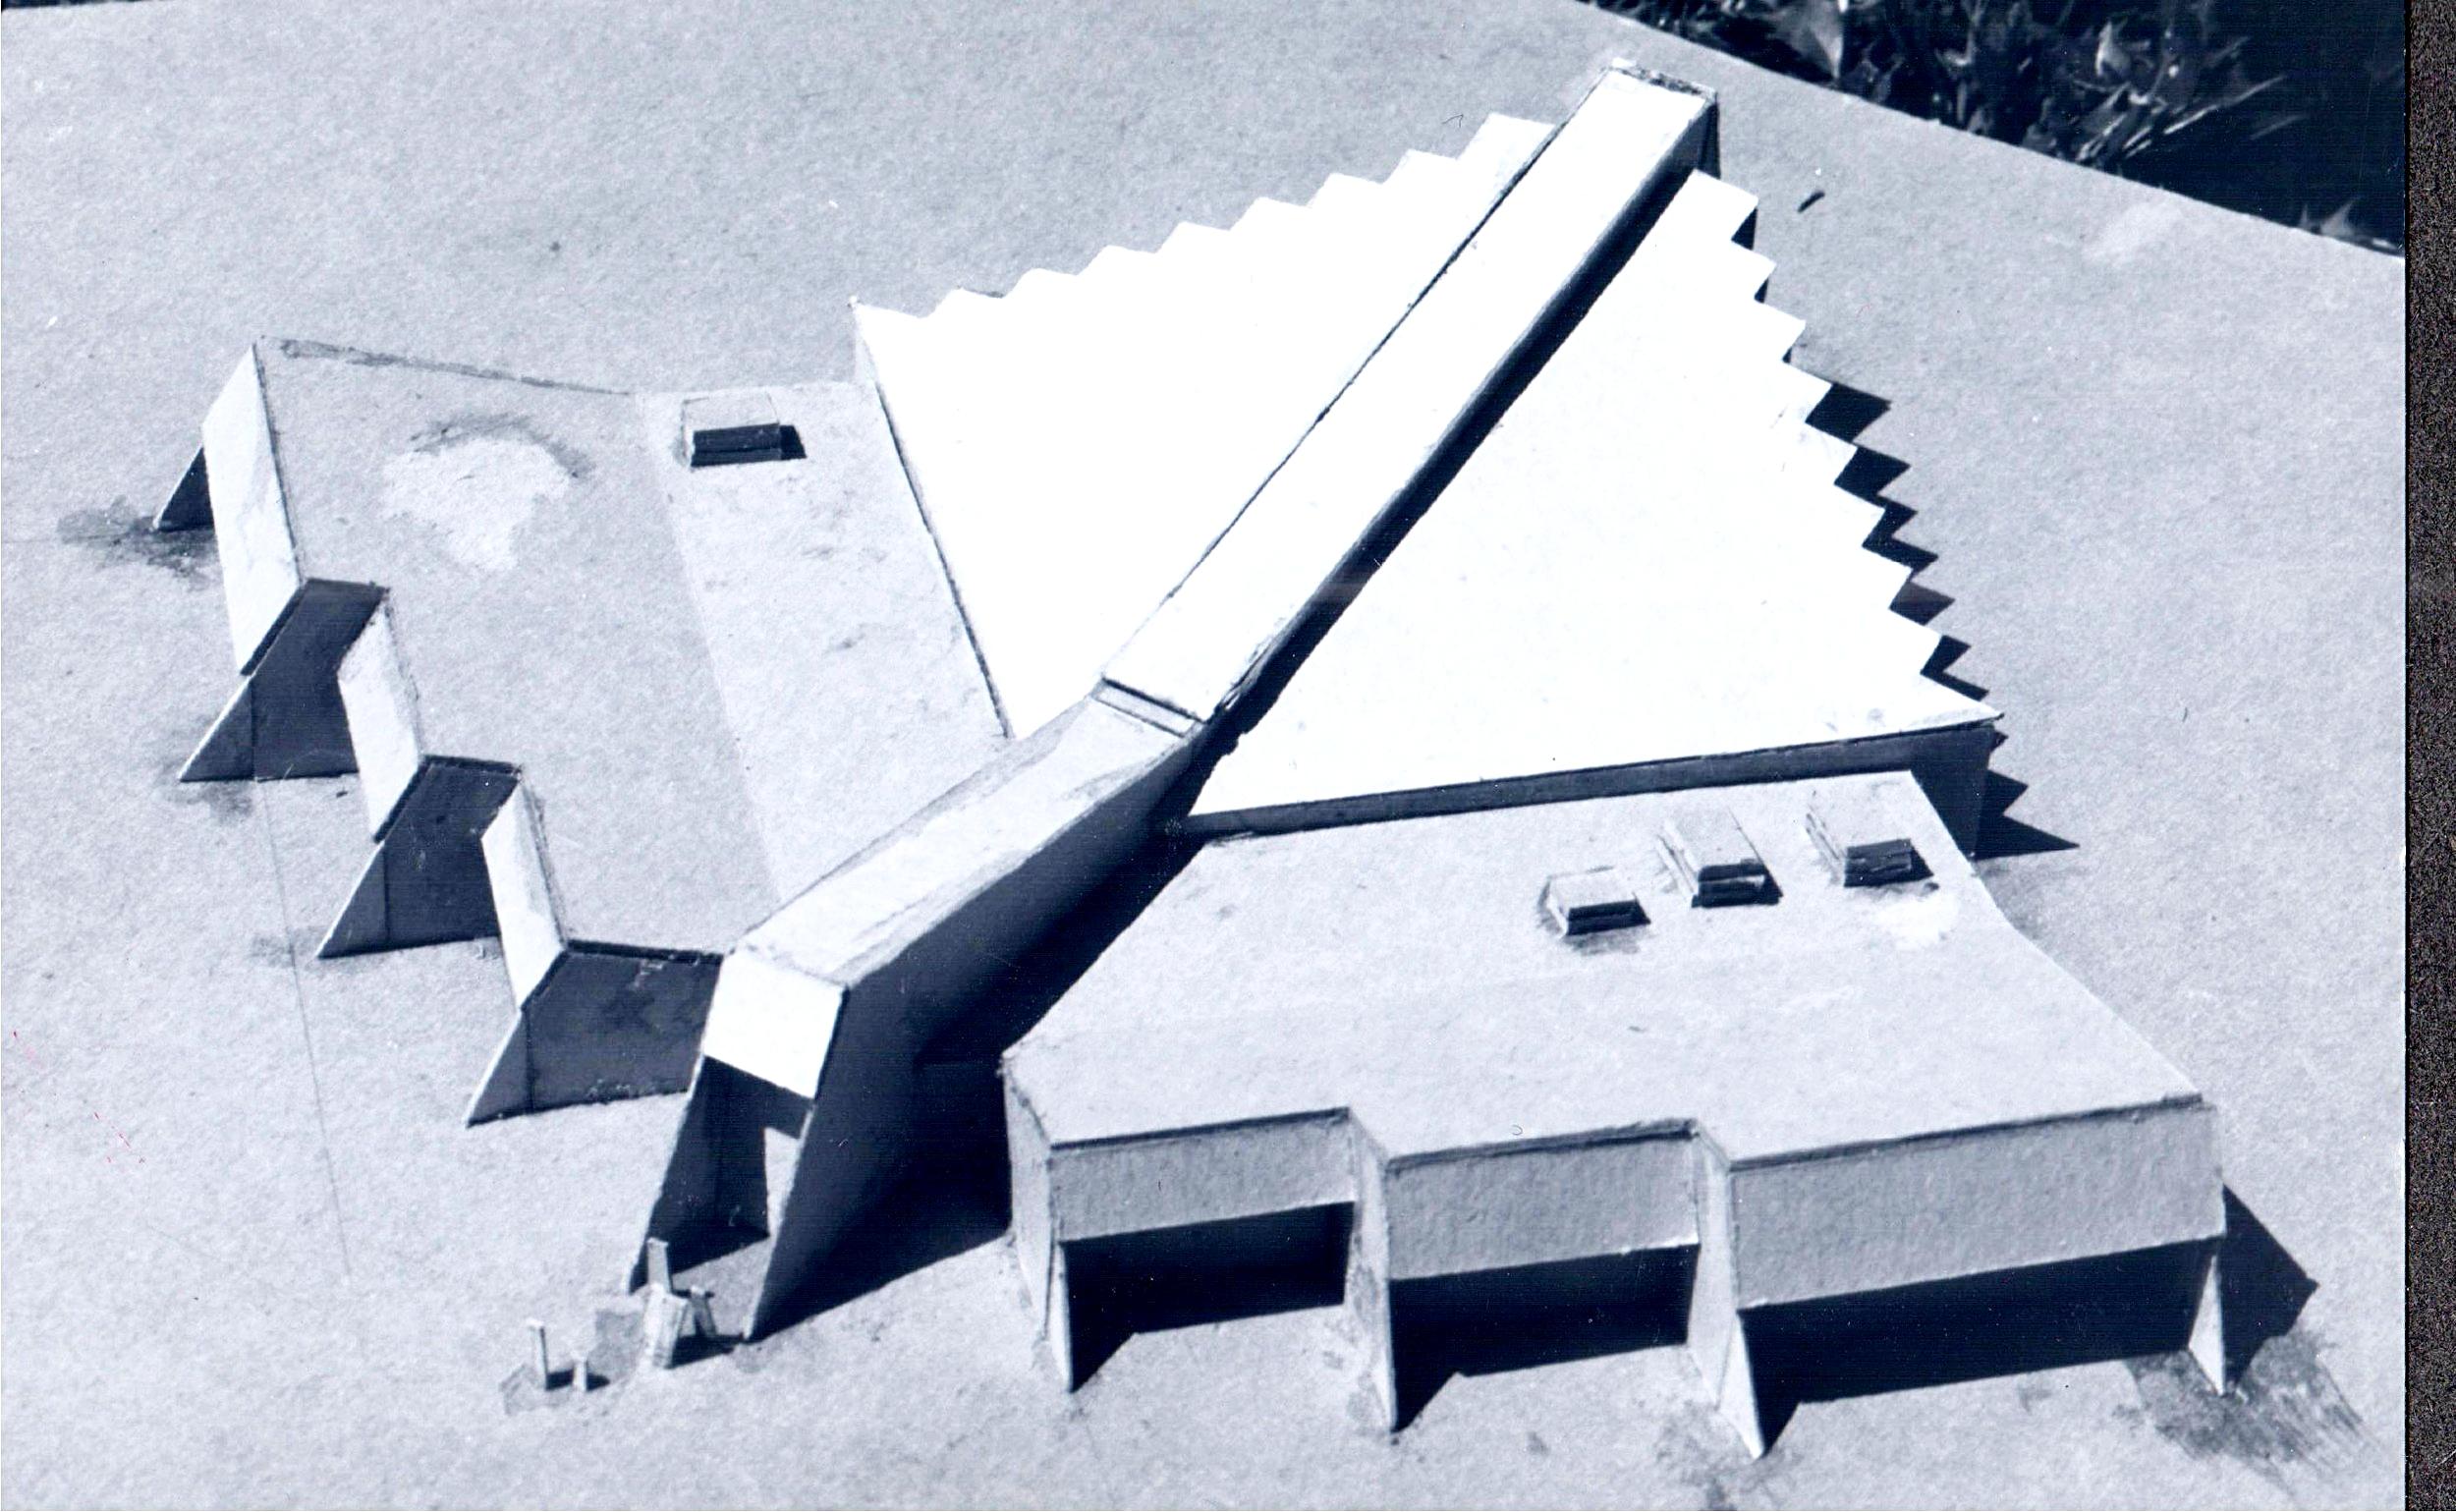 Unity Church of Tidewater renovation#sanctuary#worship#synagogue#architect